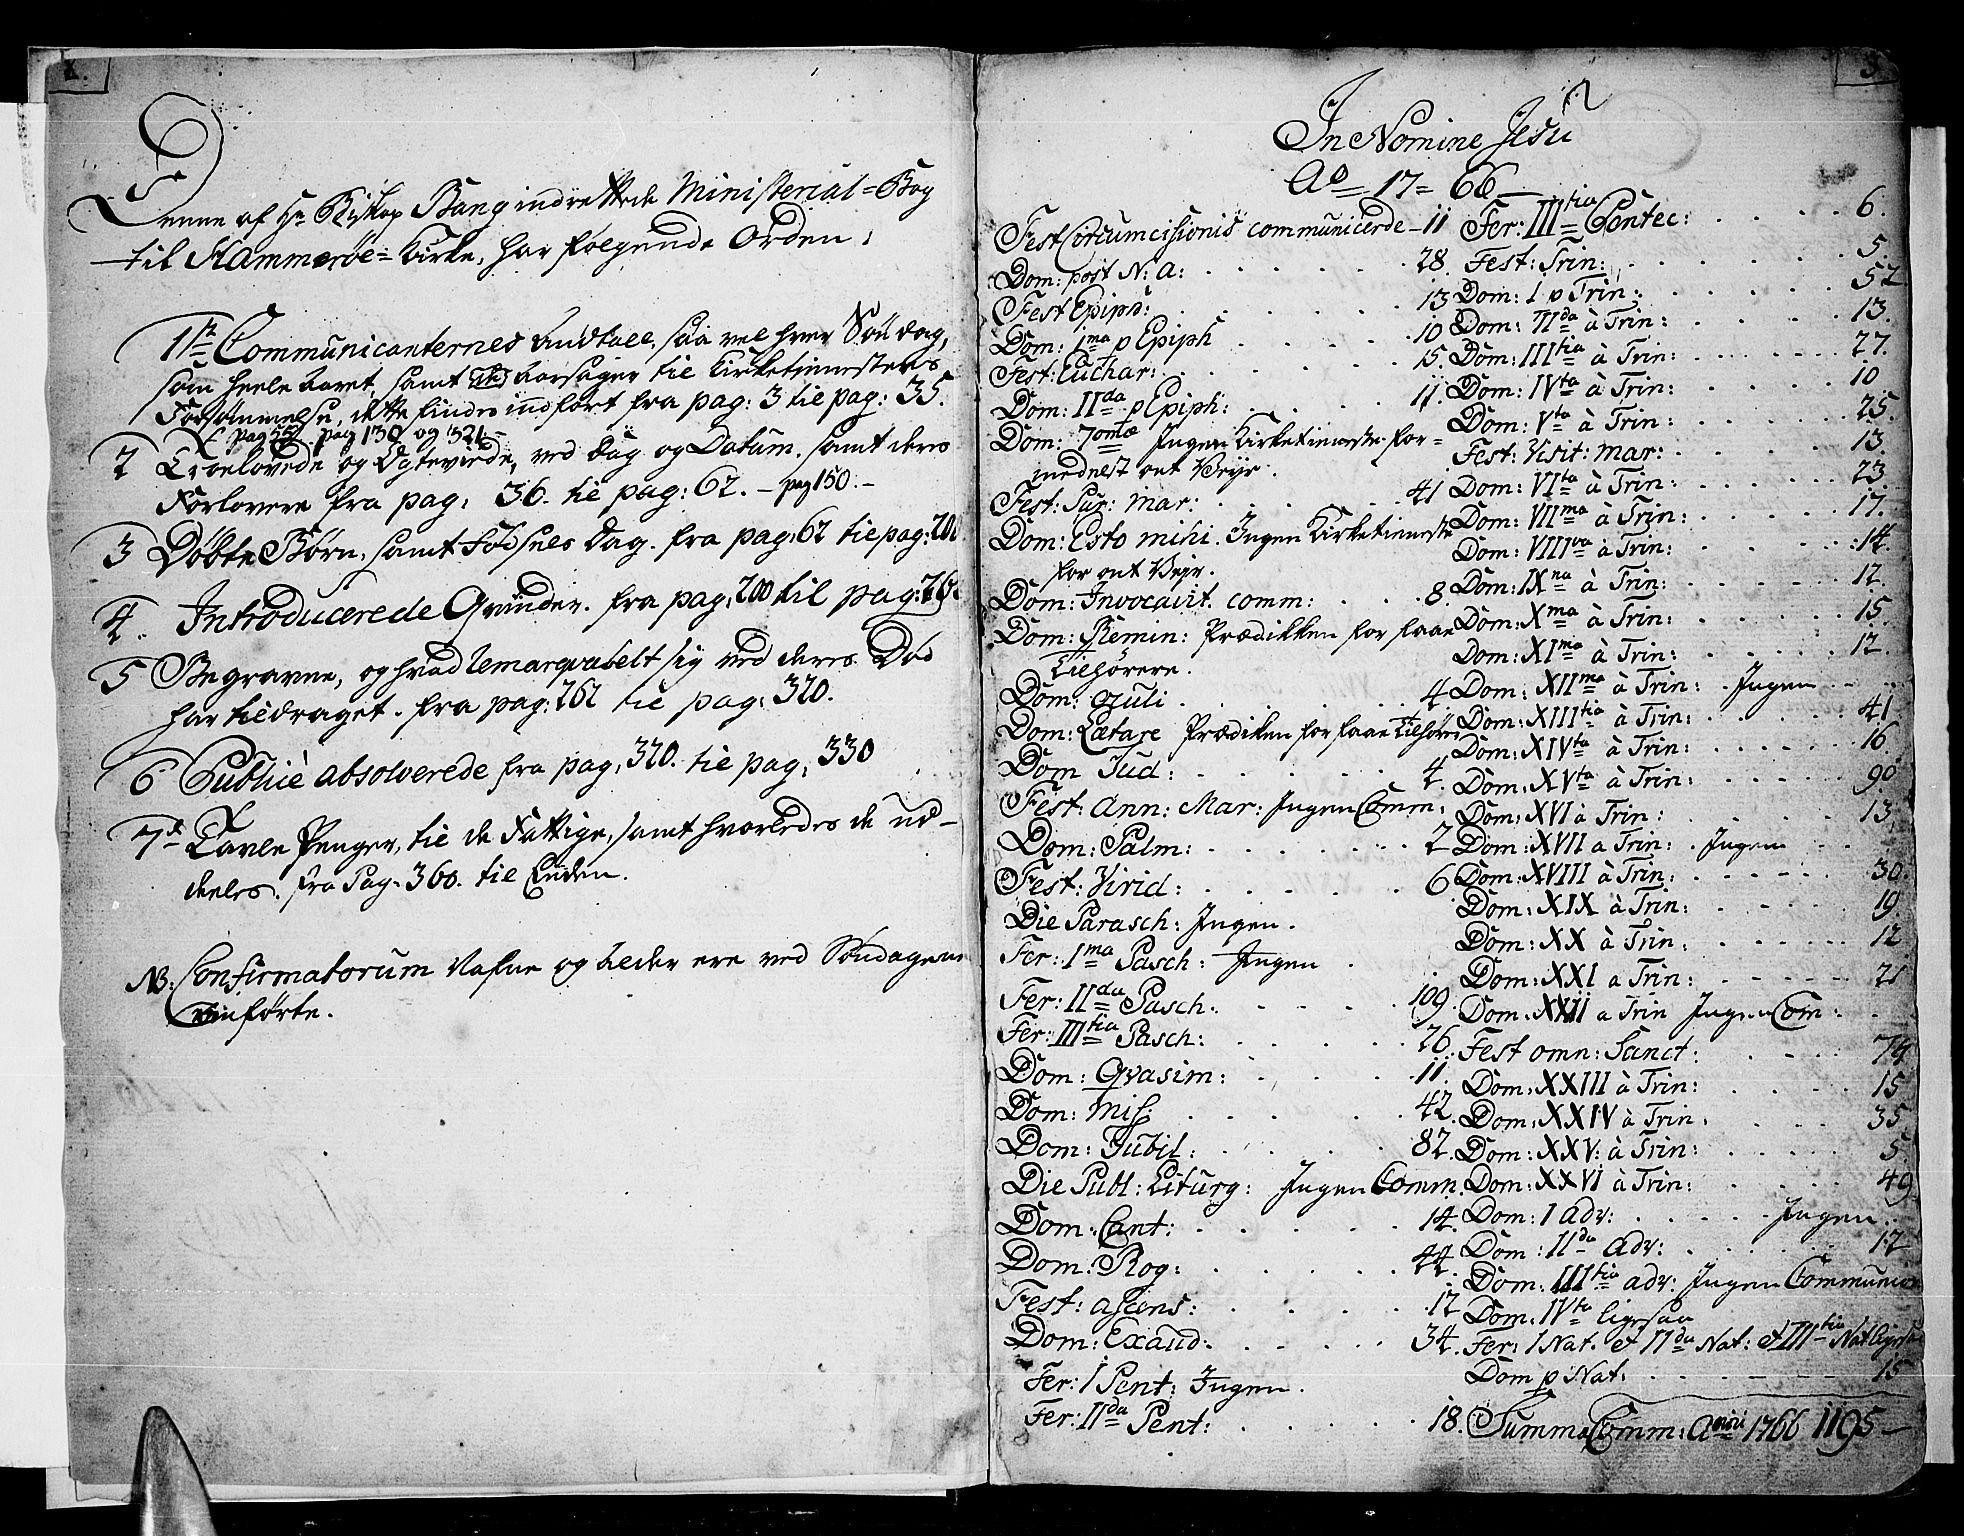 SAT, Ministerialprotokoller, klokkerbøker og fødselsregistre - Nordland, 859/L0841: Ministerialbok nr. 859A01, 1766-1821, s. 2-3